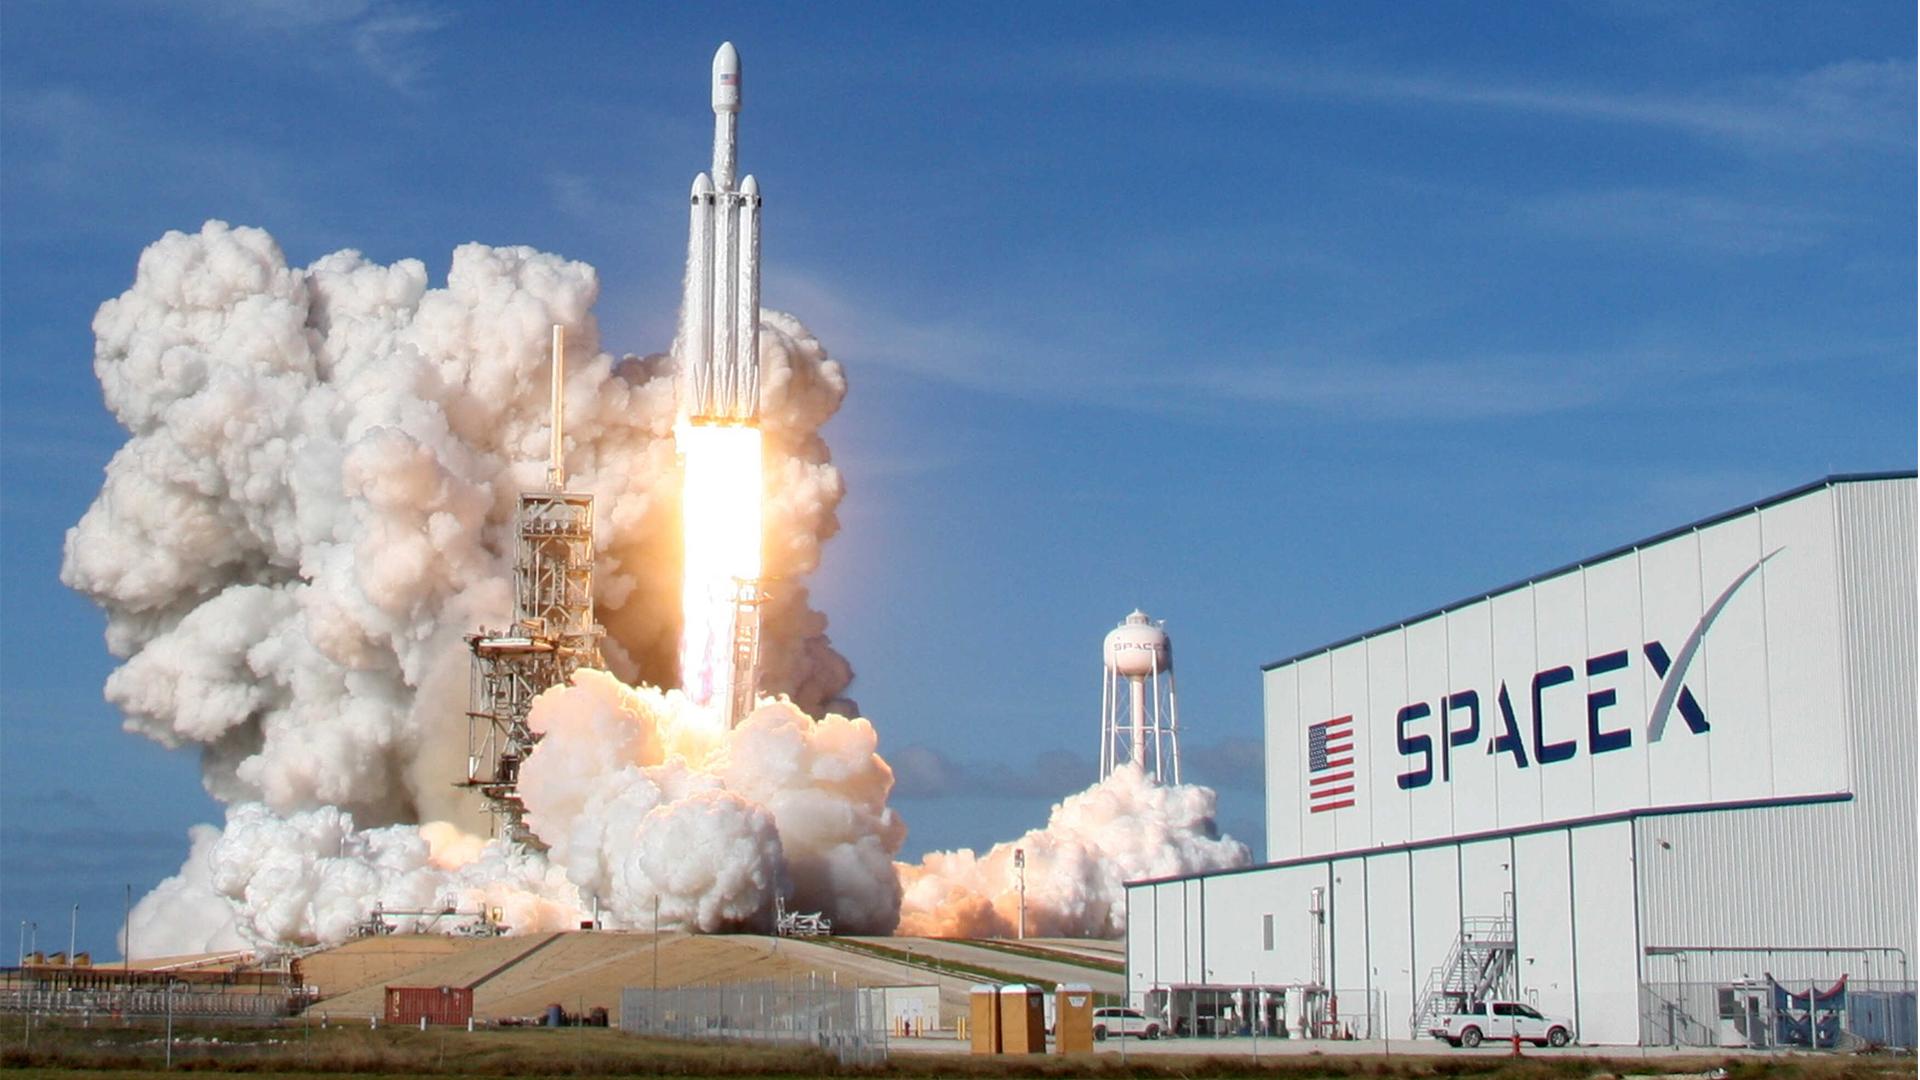 Elon Musk คาดว่า SpaceX สามารถส่งยานอวกาศ Starship ไปดาวอังคาร 2024